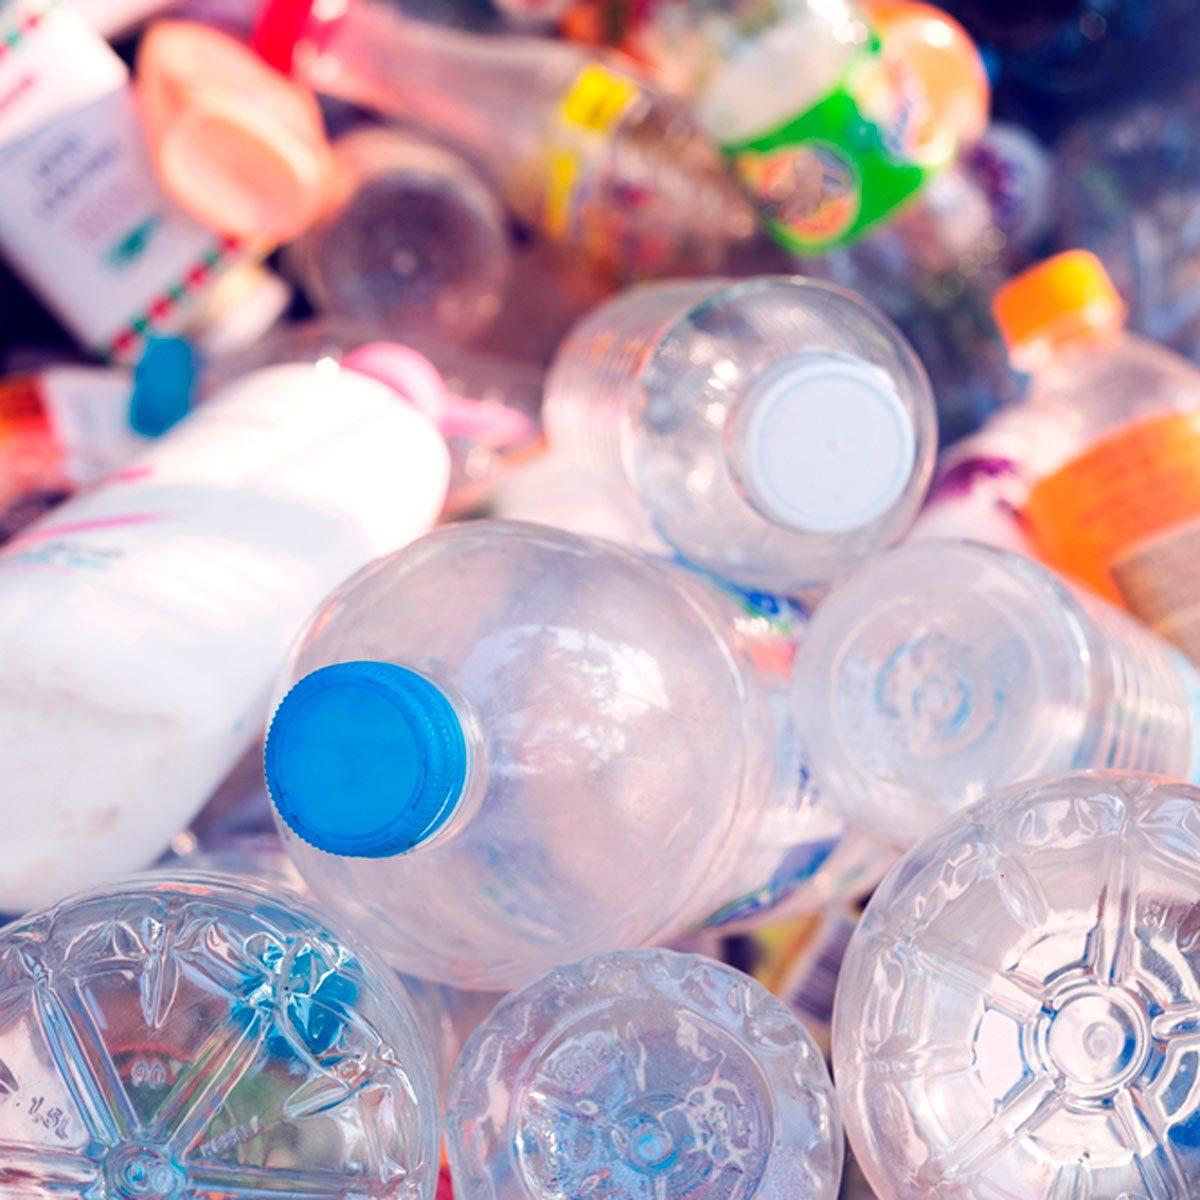 Burning plastic releases dangerous fumes